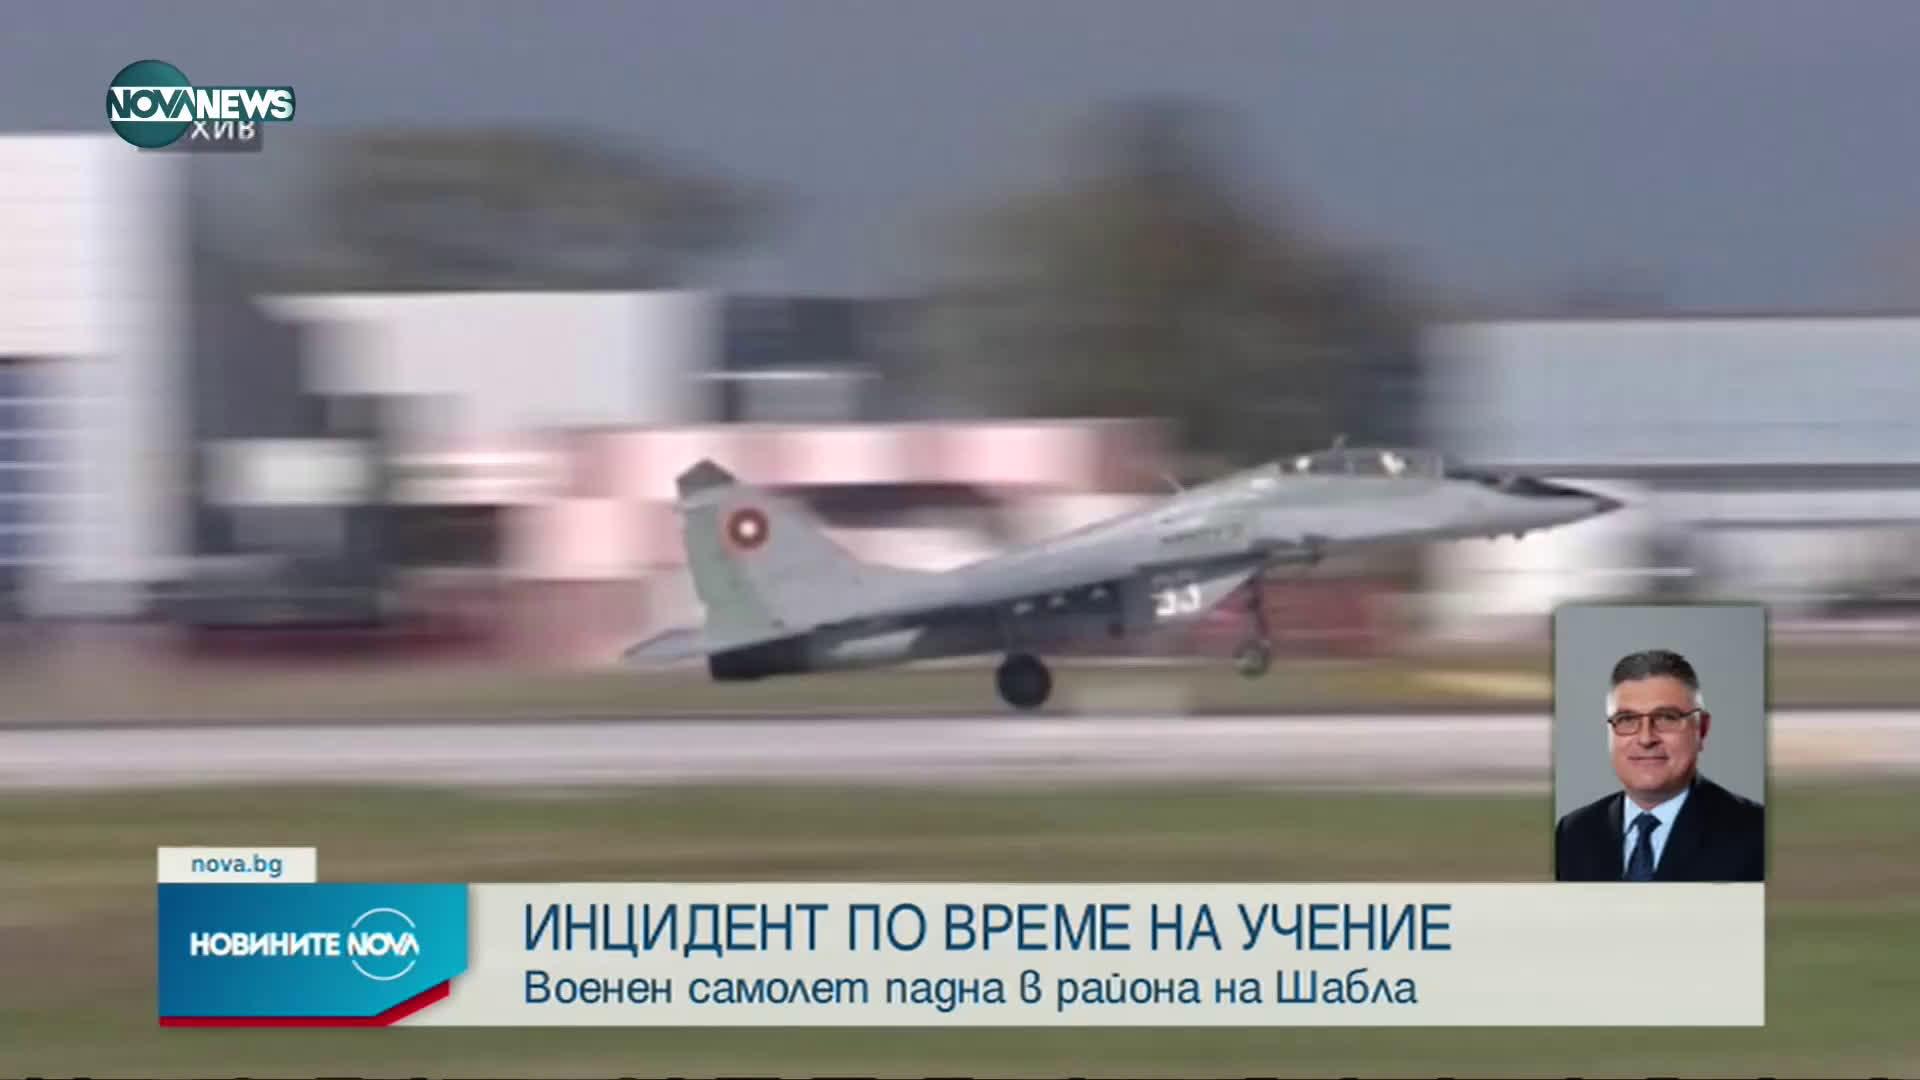 Военен самолет на ВВС падна в района на Шабла